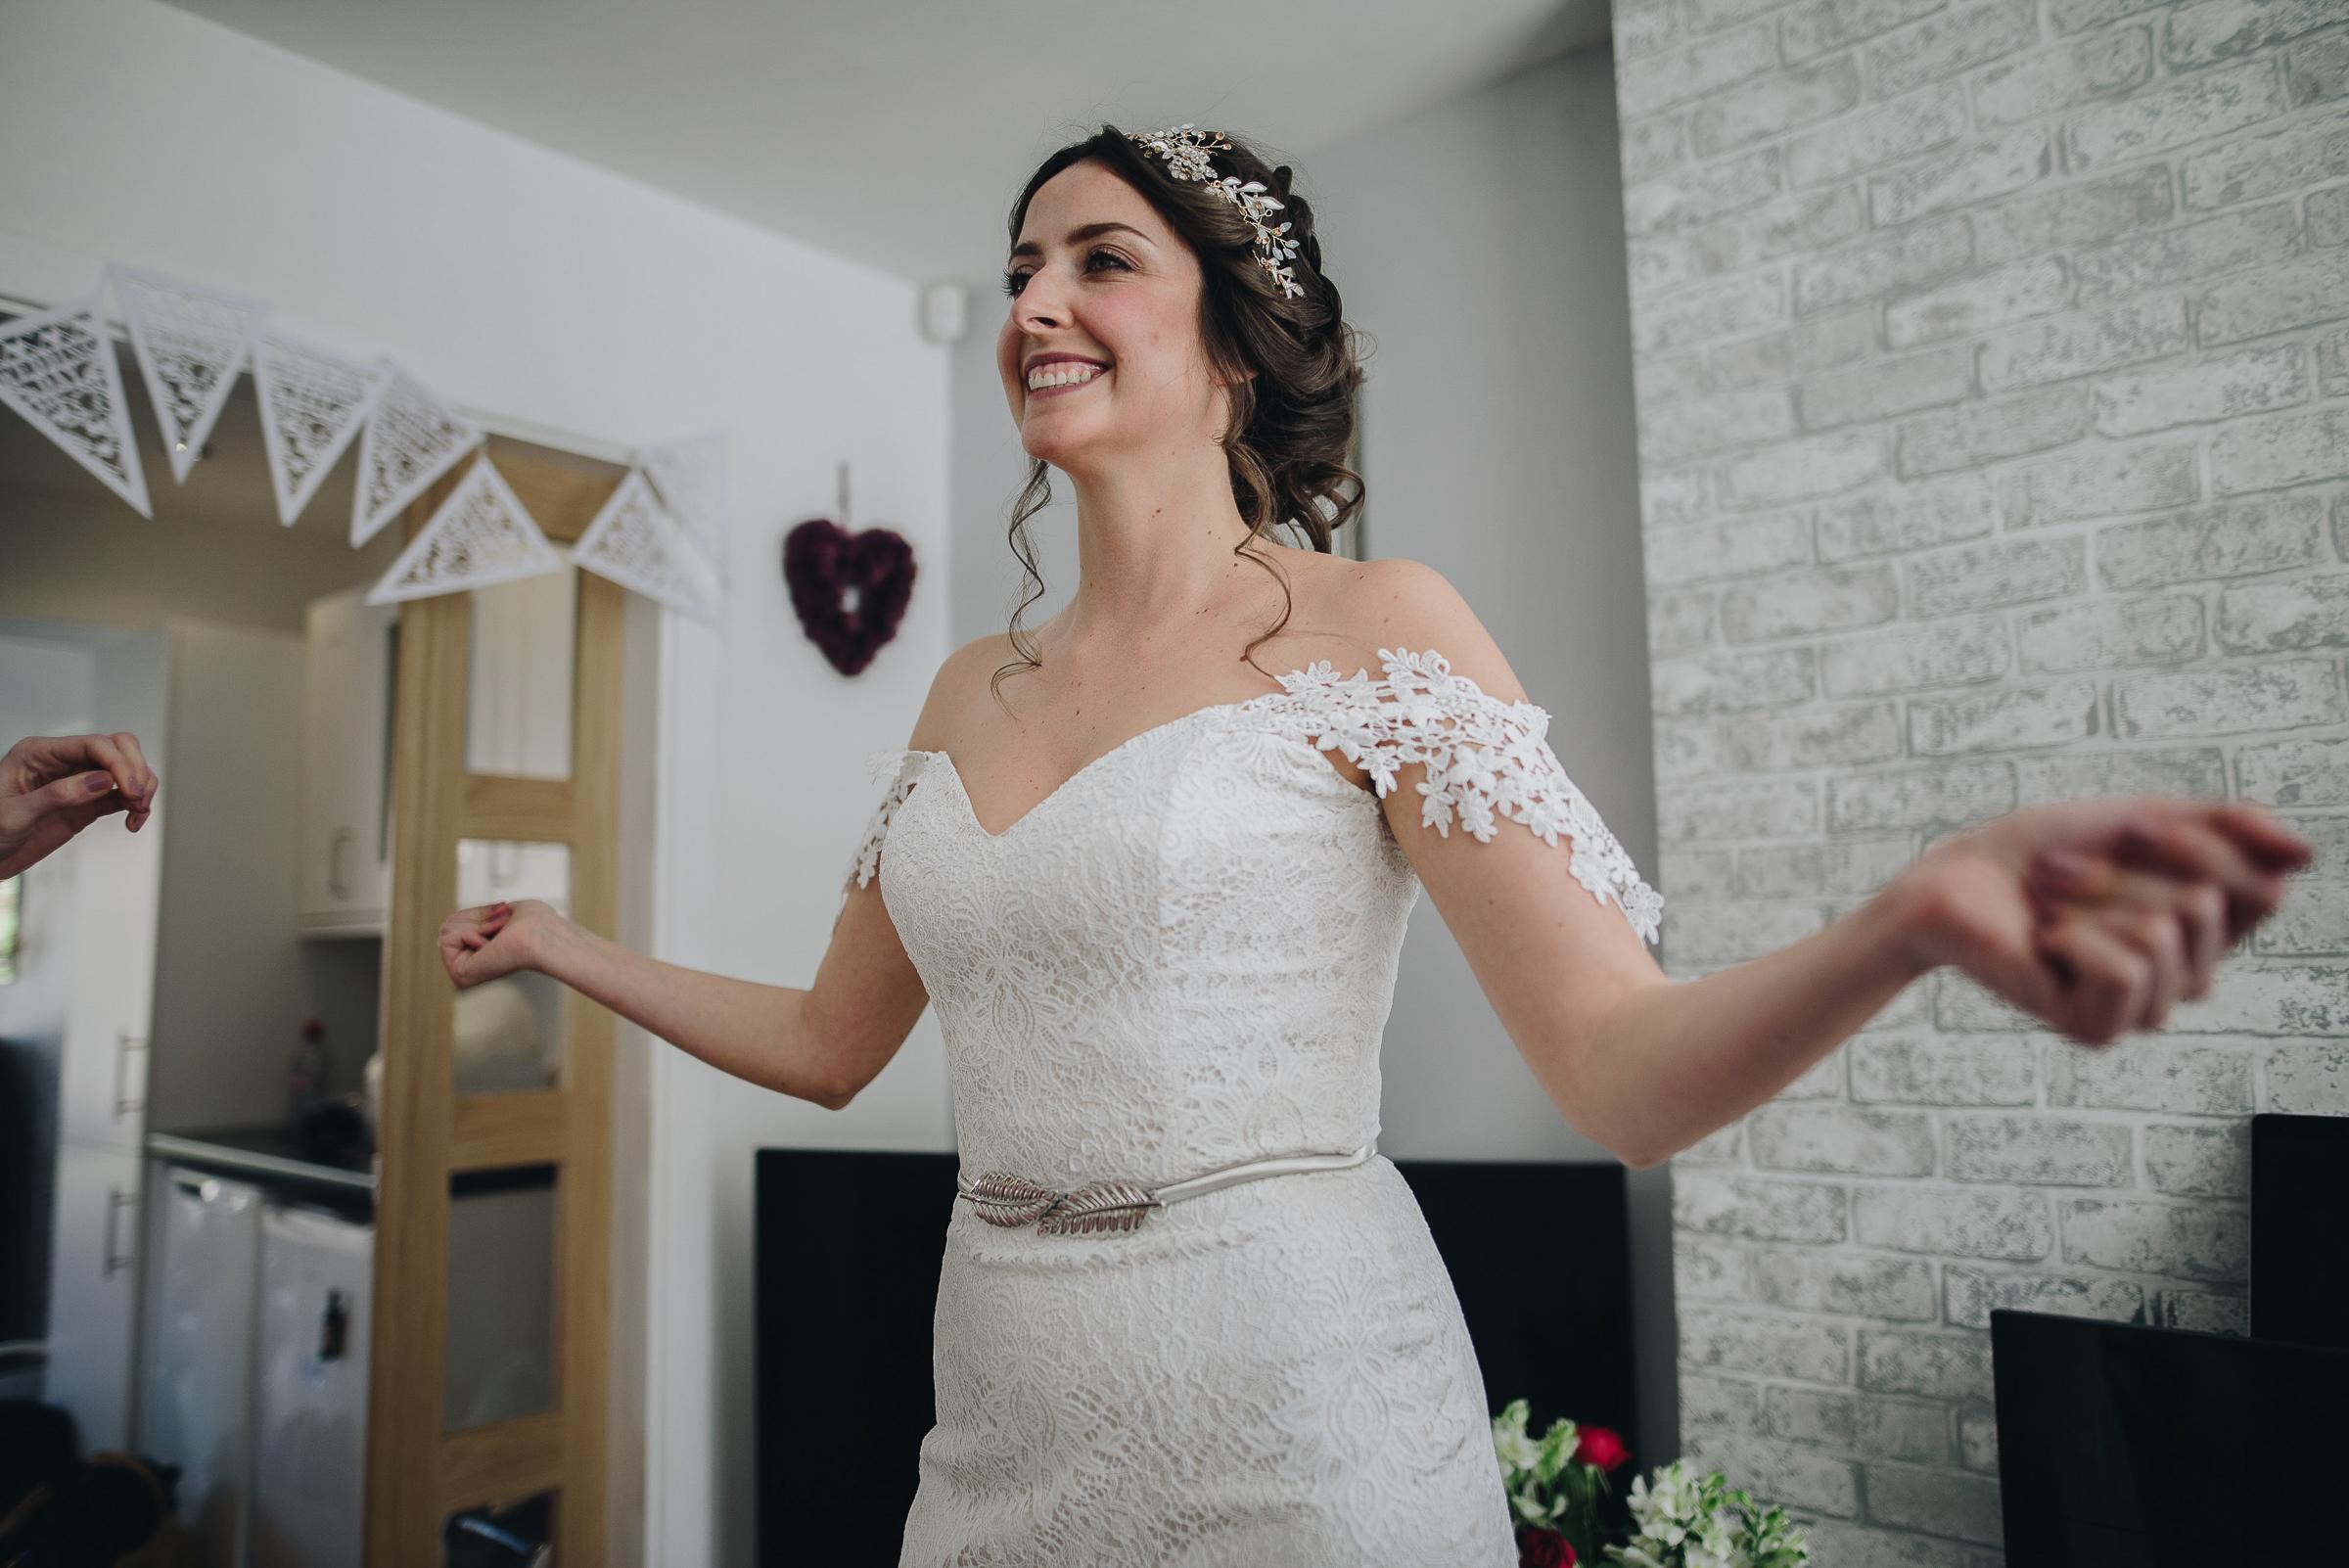 Rochdale-town-hall-vegan-harry-potter-wedding-photography-6.jpg